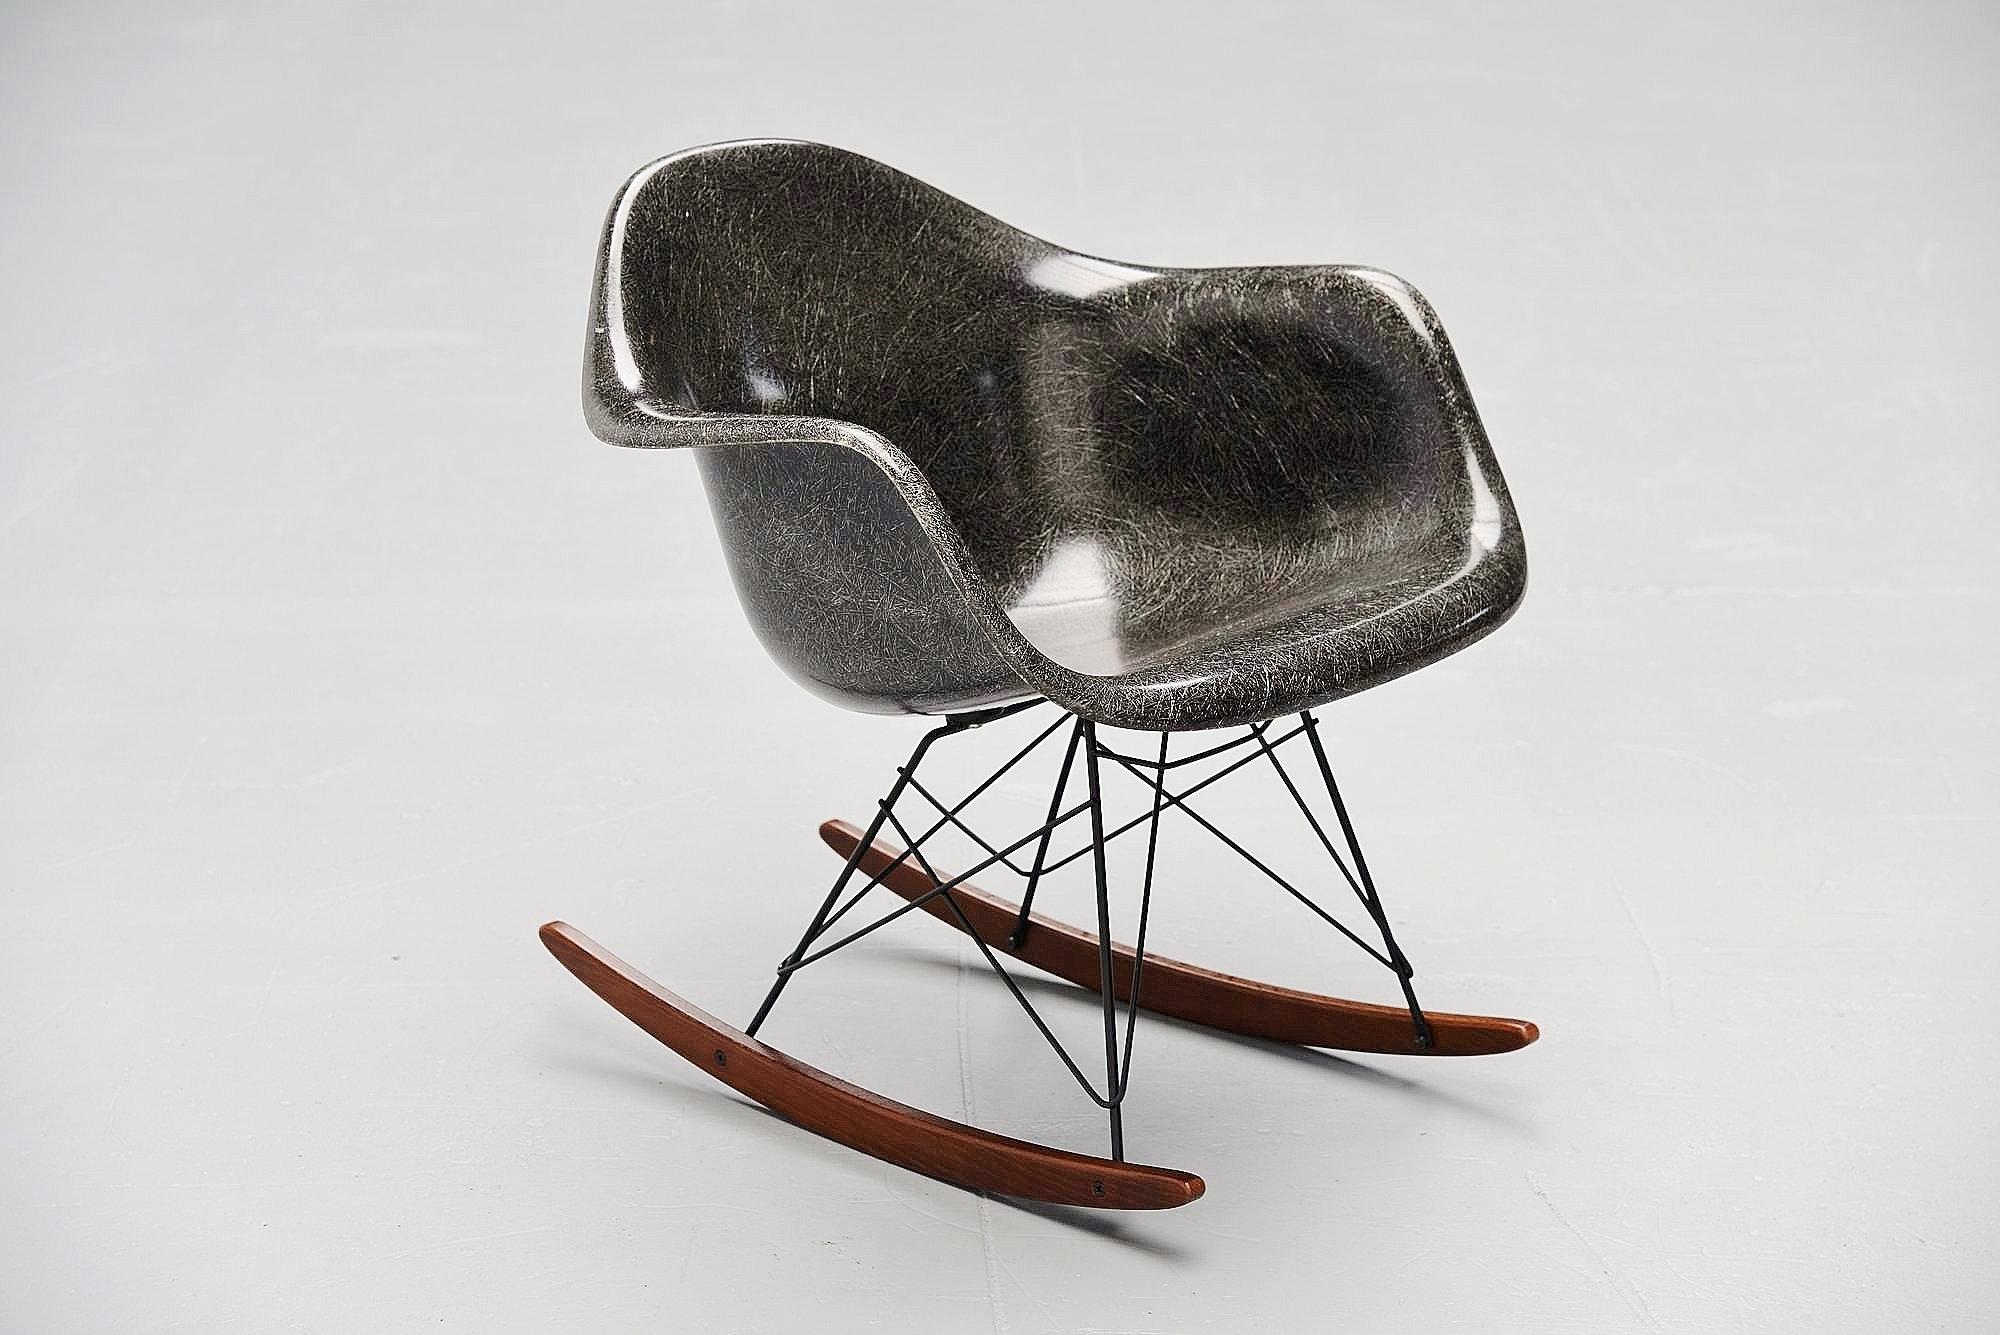 herman miller eames chair replica adirondack patterns curved back charles rar rocking 1965 – massmoderndesign